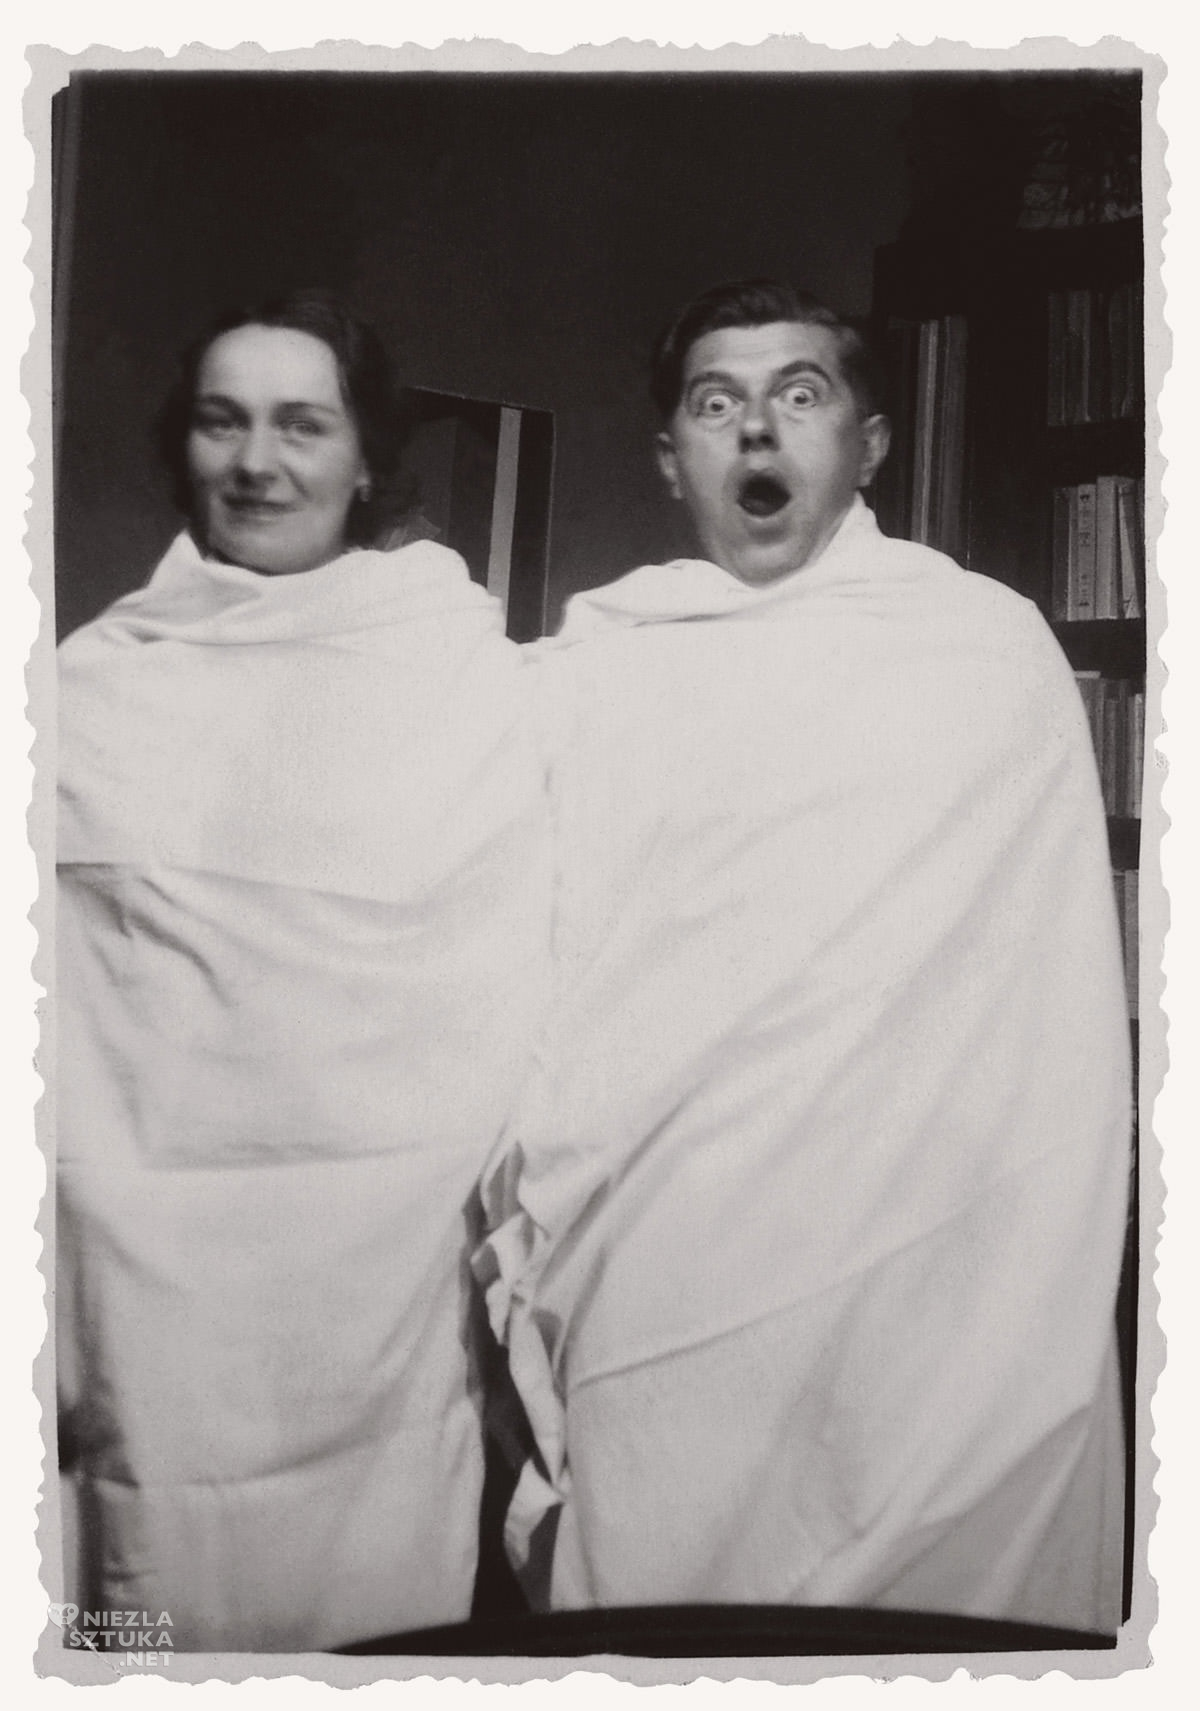 René Magritte, Georgette Magritte, żona, bukiet, fotografia, Niezła Sztuka